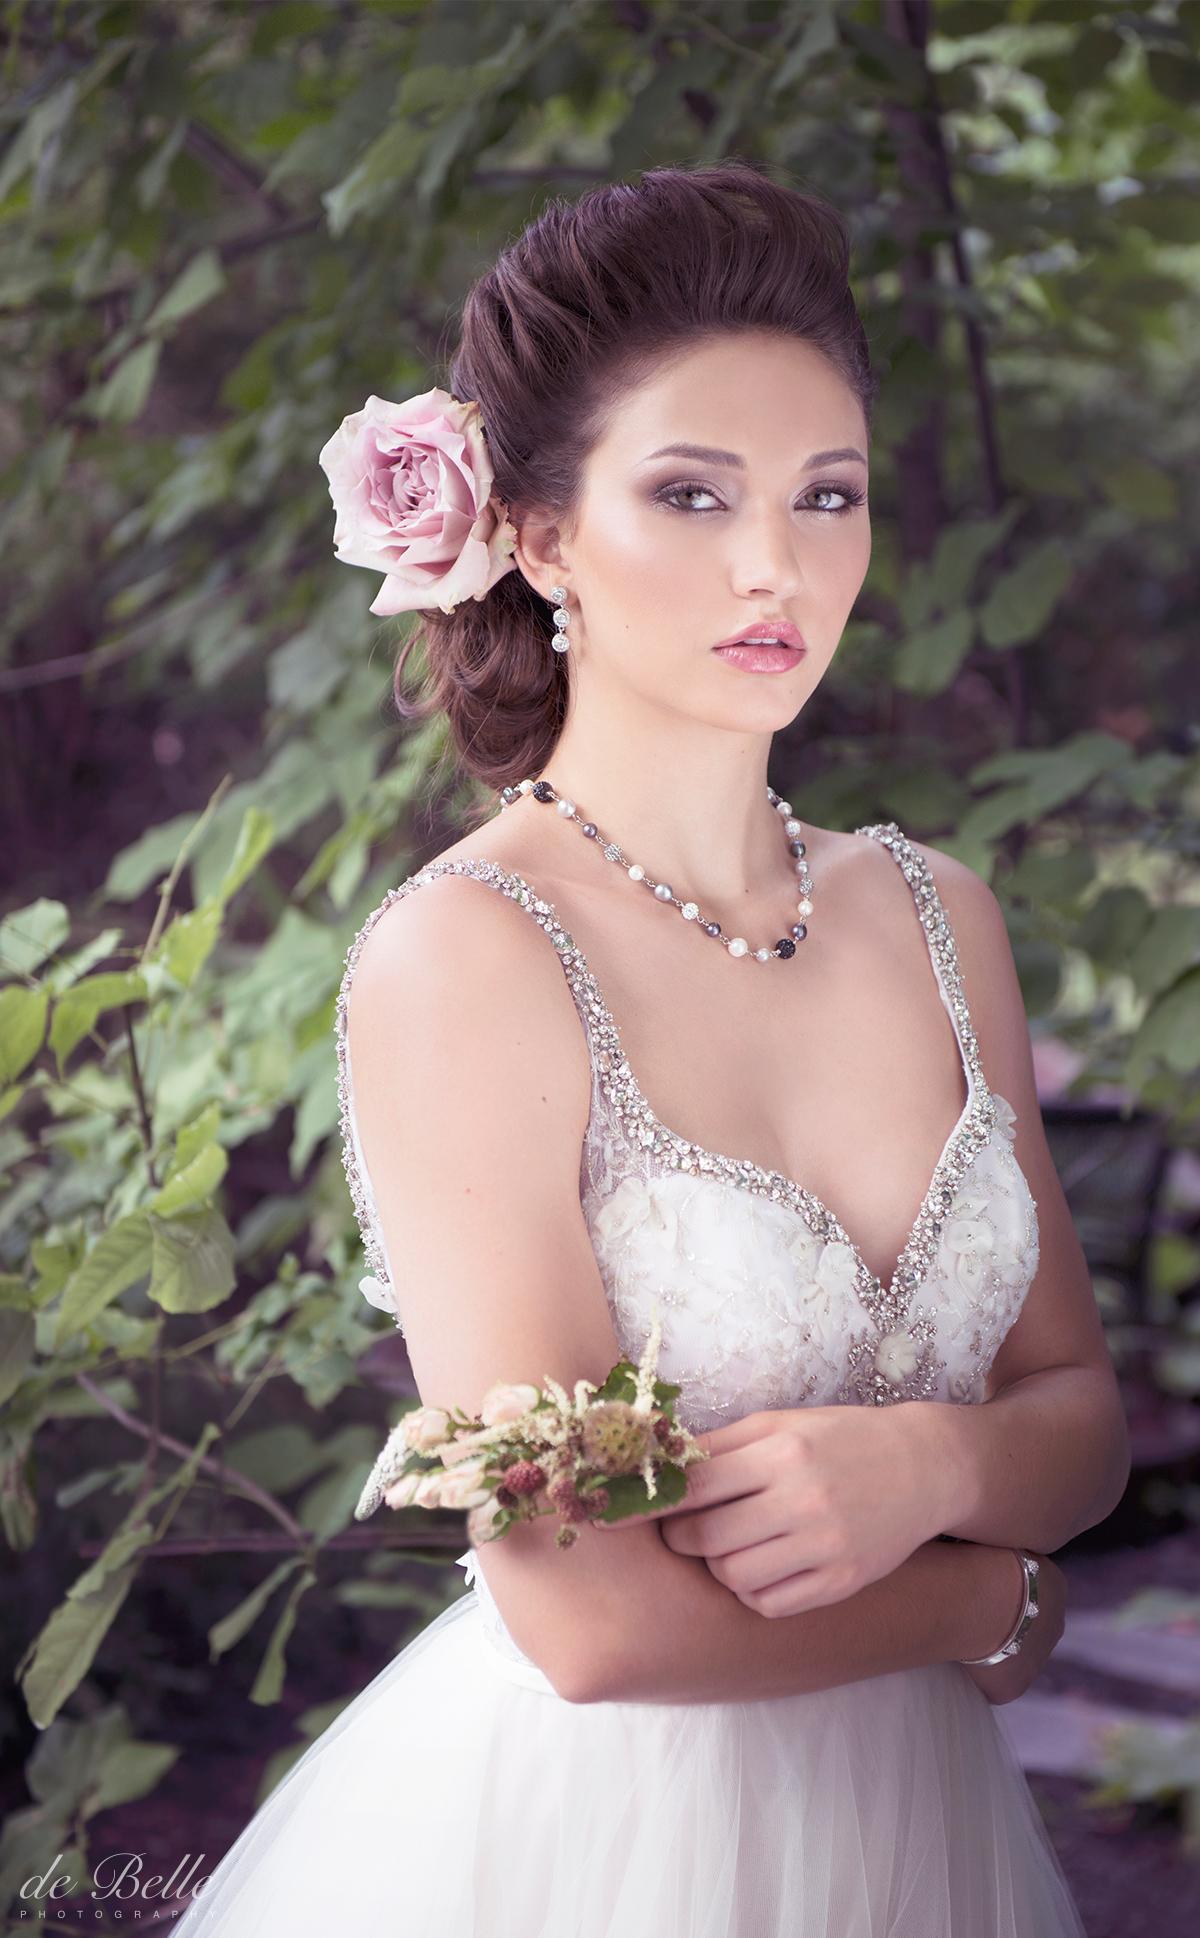 Montreal-Wedding-Photographer-Debelle-EW7